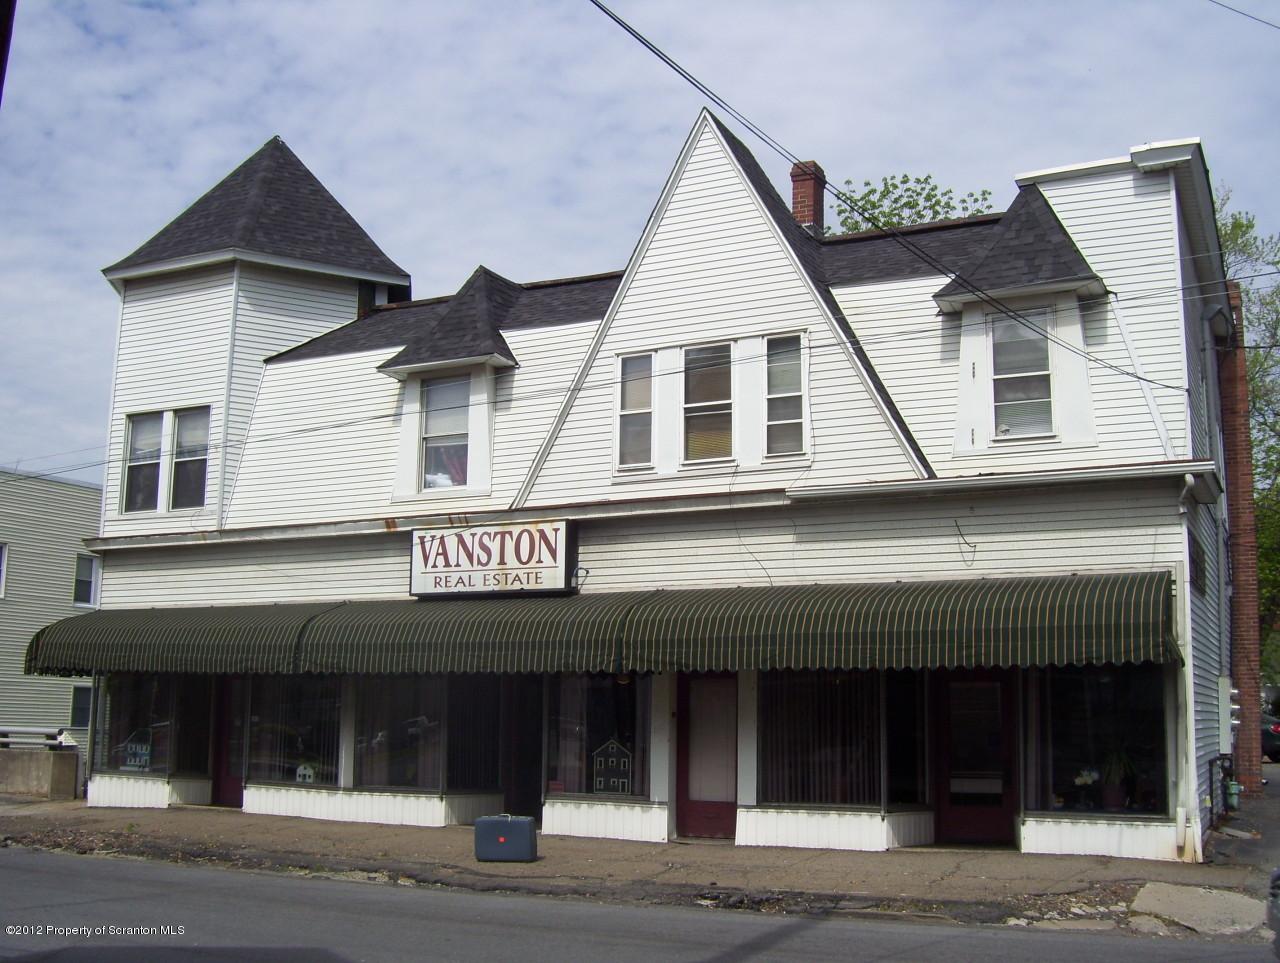 109-113 Main St, Blakely, Pennsylvania 18447, ,5 BathroomsBathrooms,Commercial,For Sale,Main,12-2239